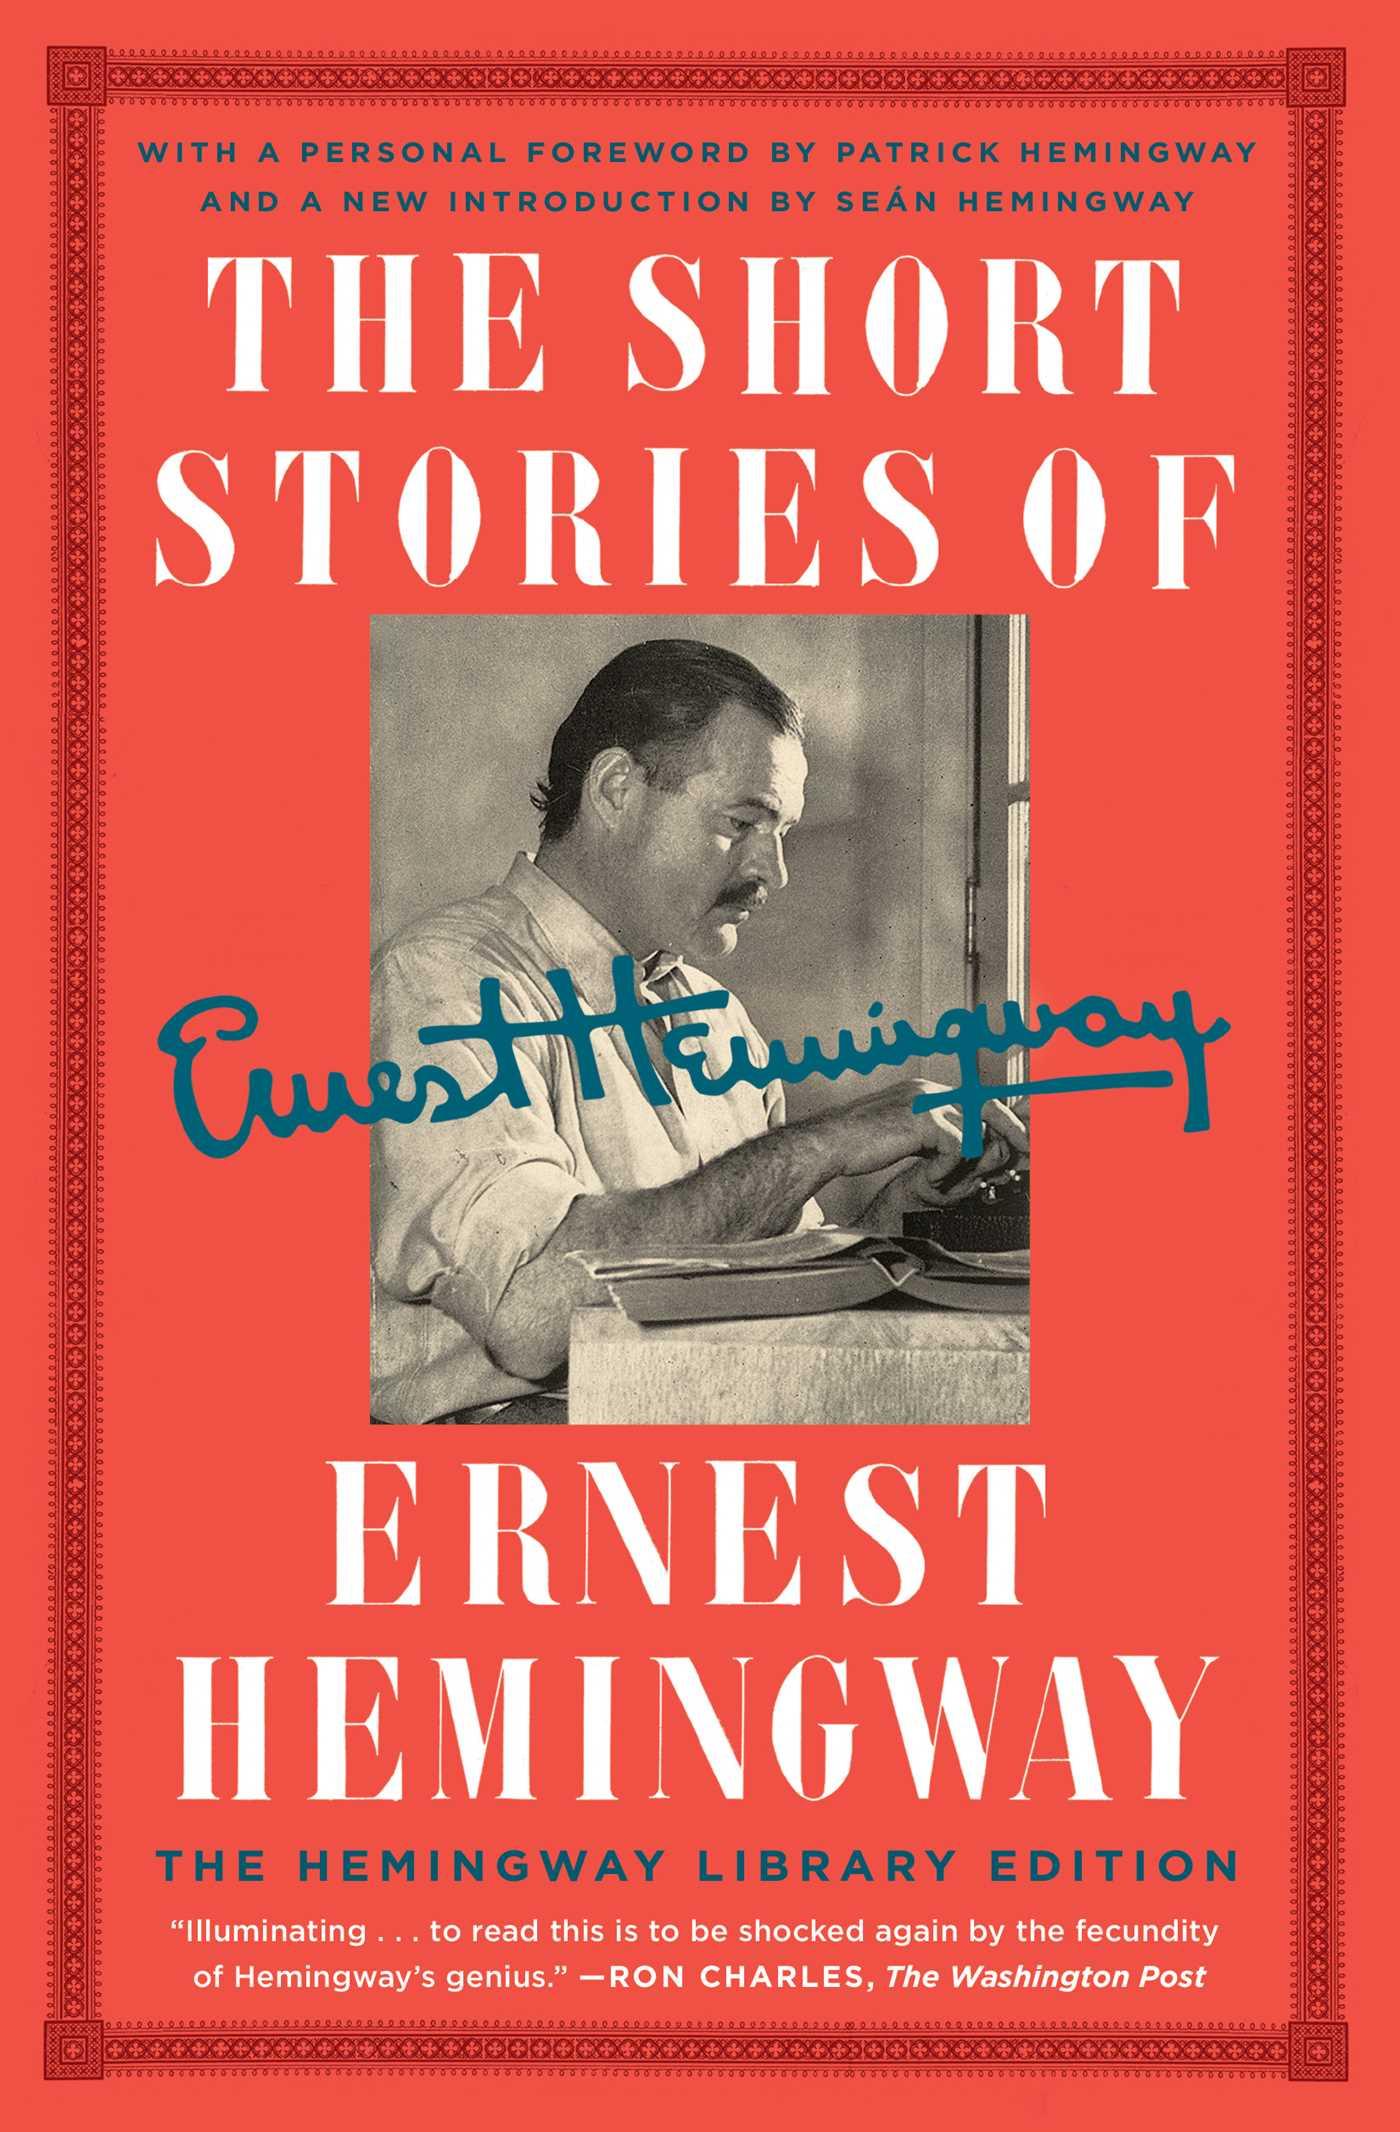 The short stories of ernest hemingway 9781476787671 hr